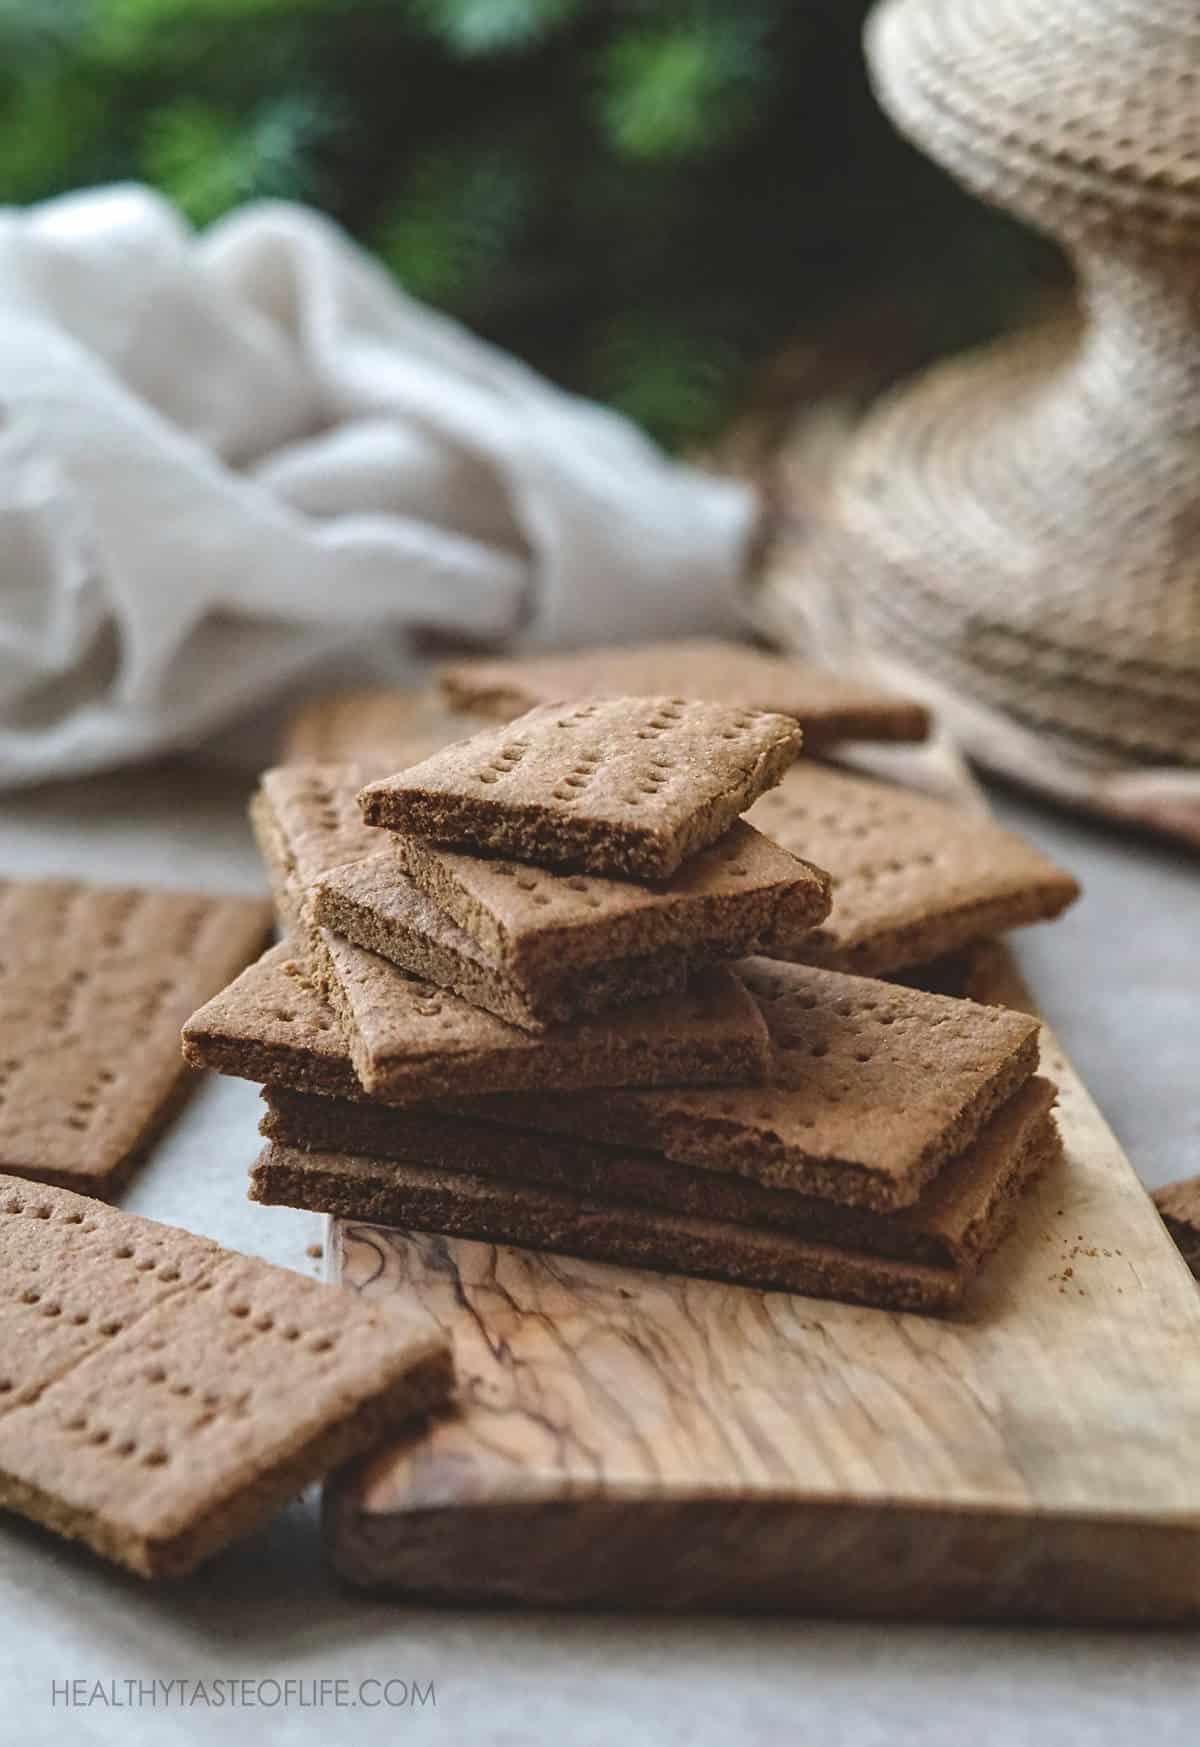 Gluten free graham crackers recipe – Vegan graham crackers, dairy free, soy free graham crackers with cinnamon and maple sugar #grahamcrackers #healthy